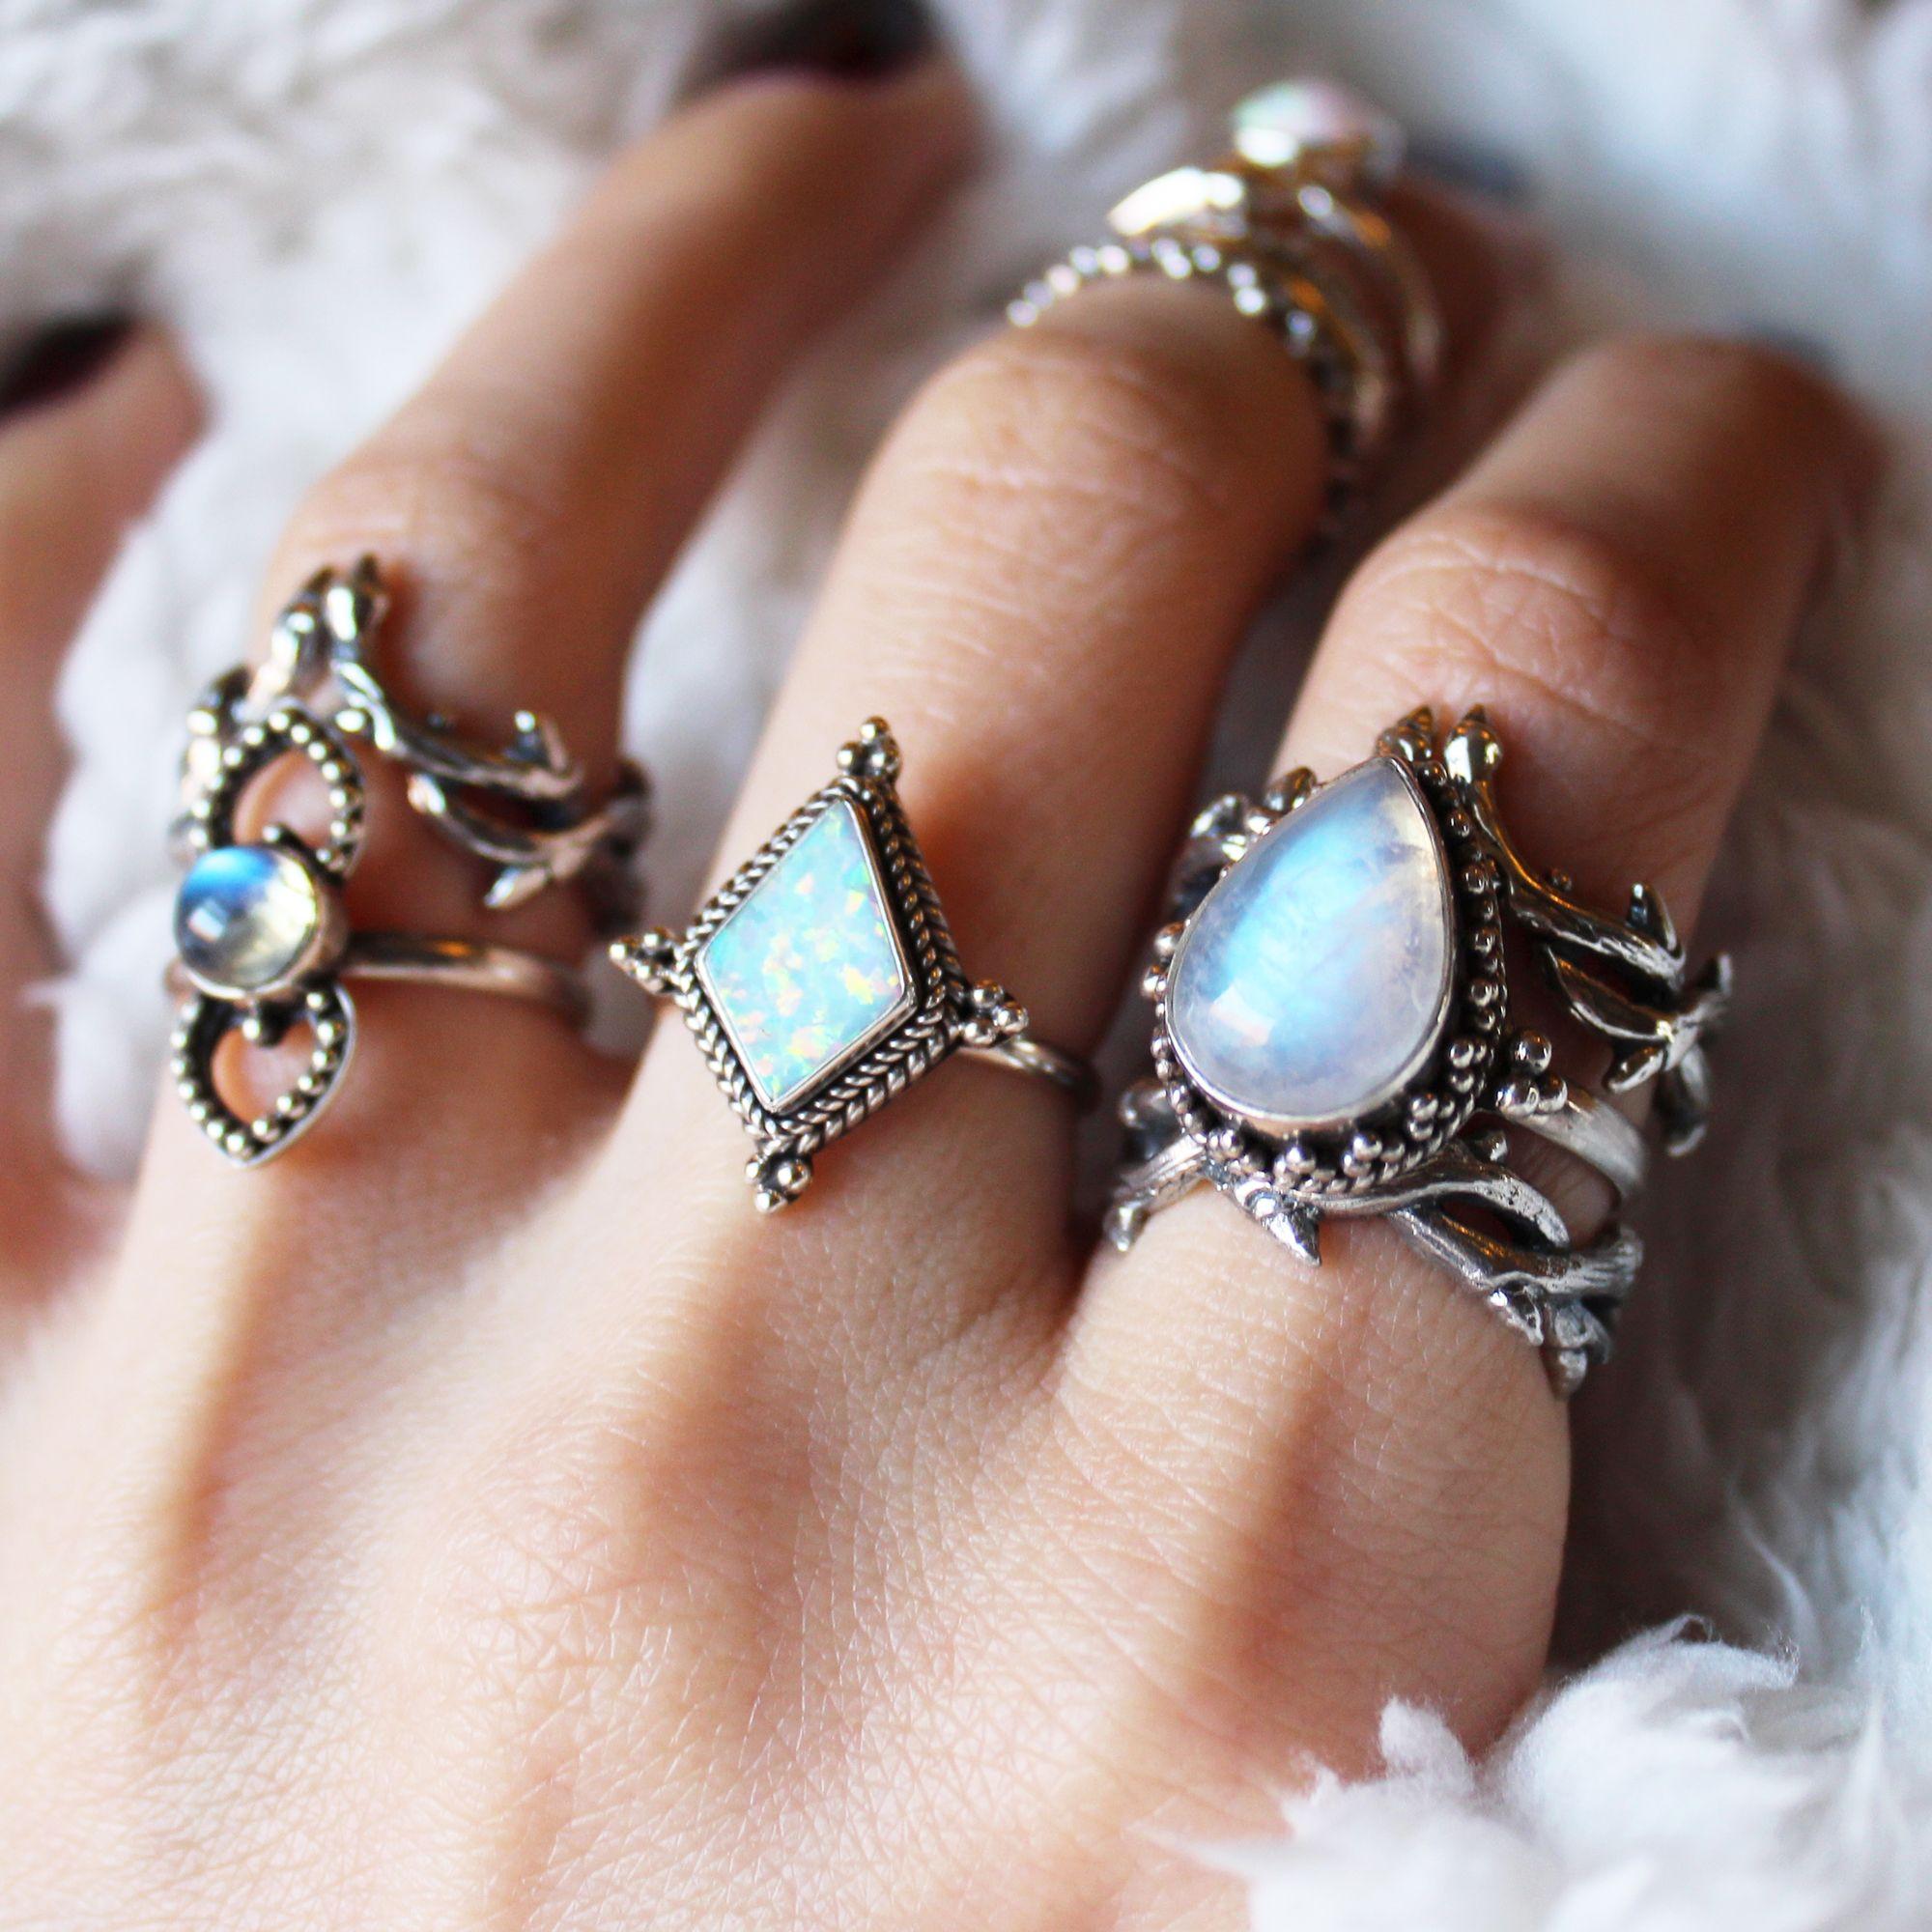 Spy Ring Jewelry